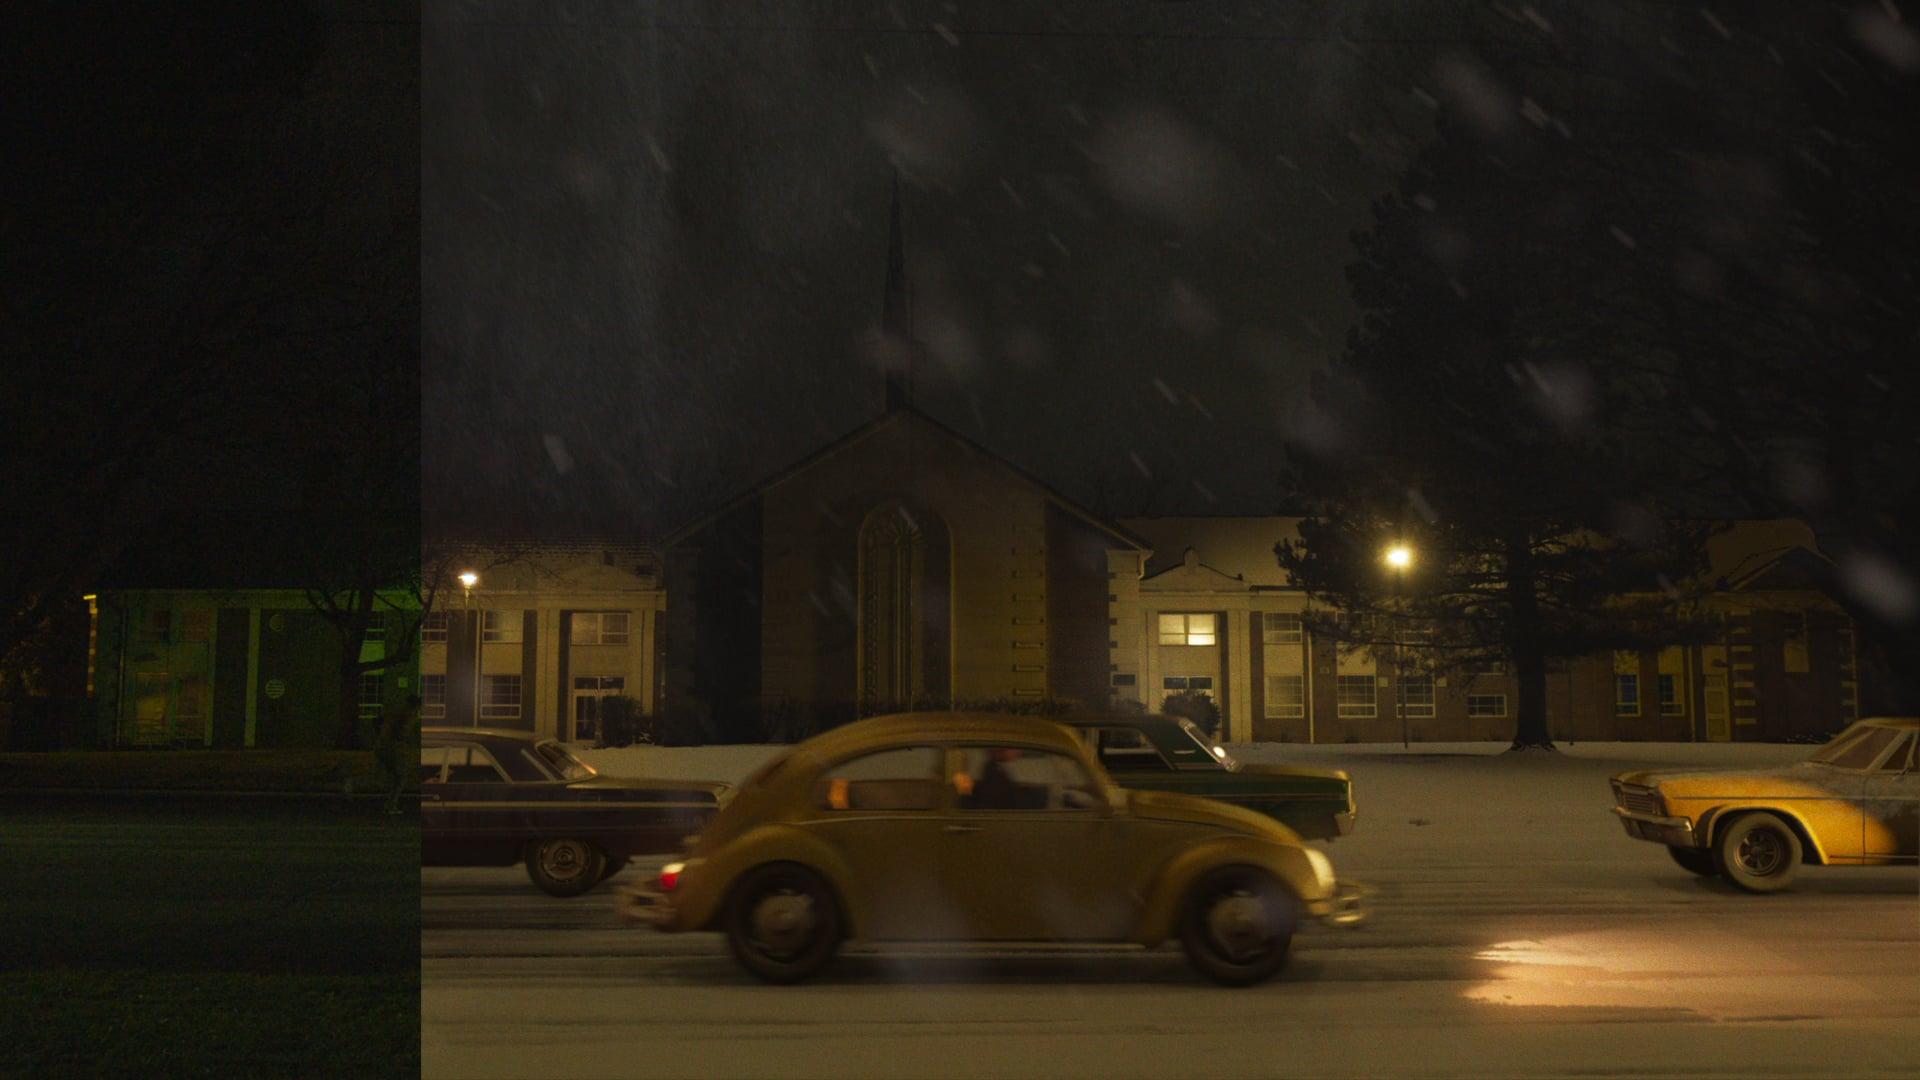 Snowy Church VFX - Houdini, Octane, Nuke